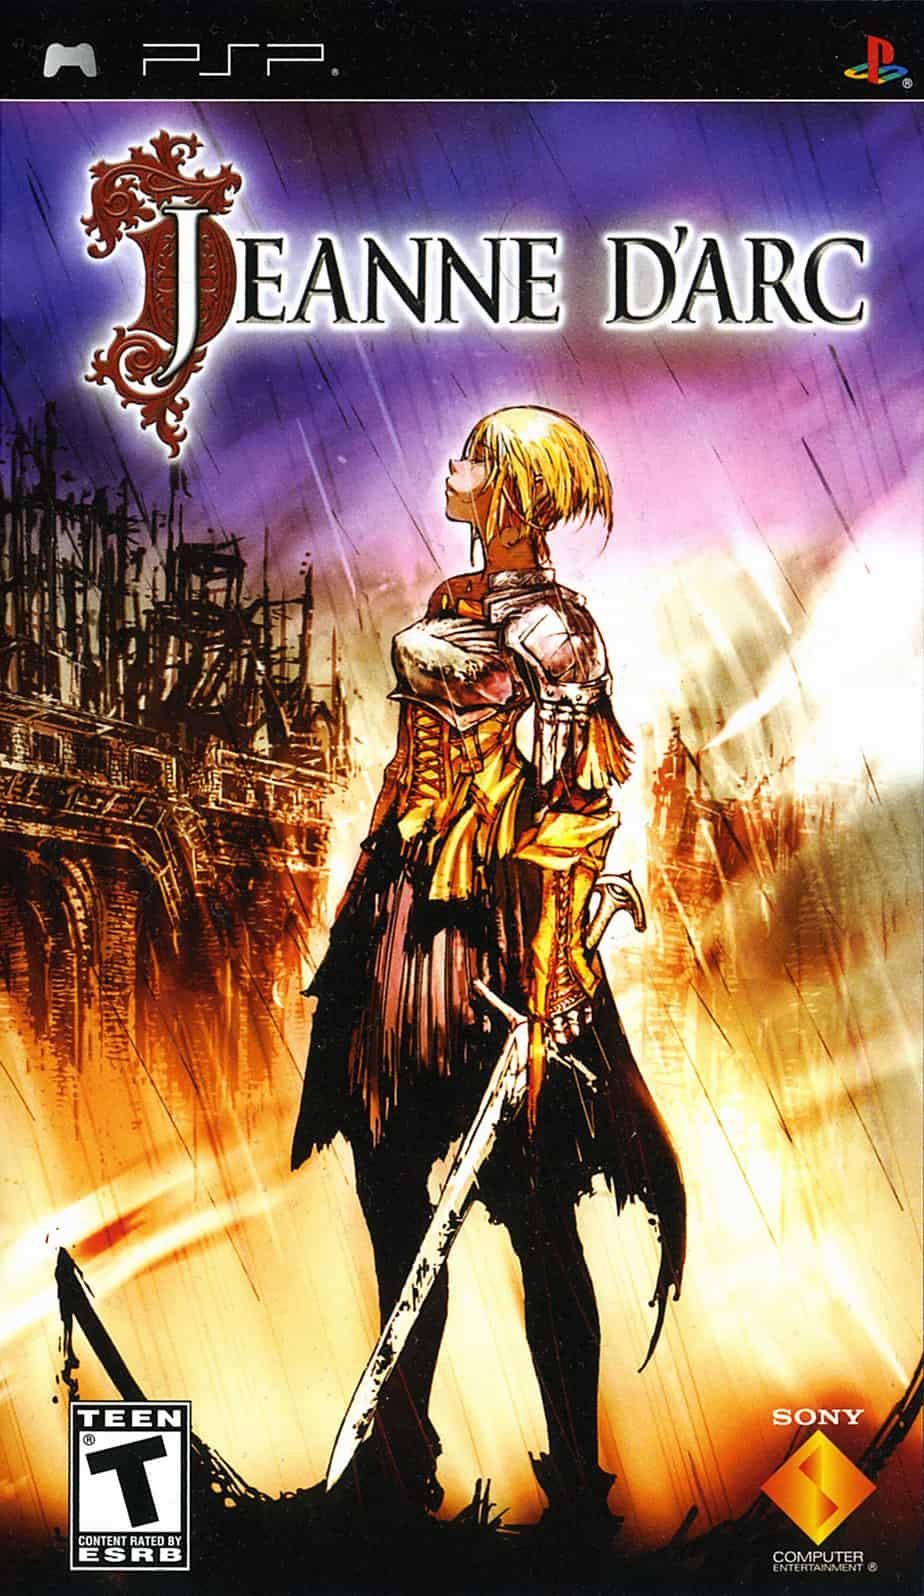 Best PSP RPGs - Jeanne D'Arc